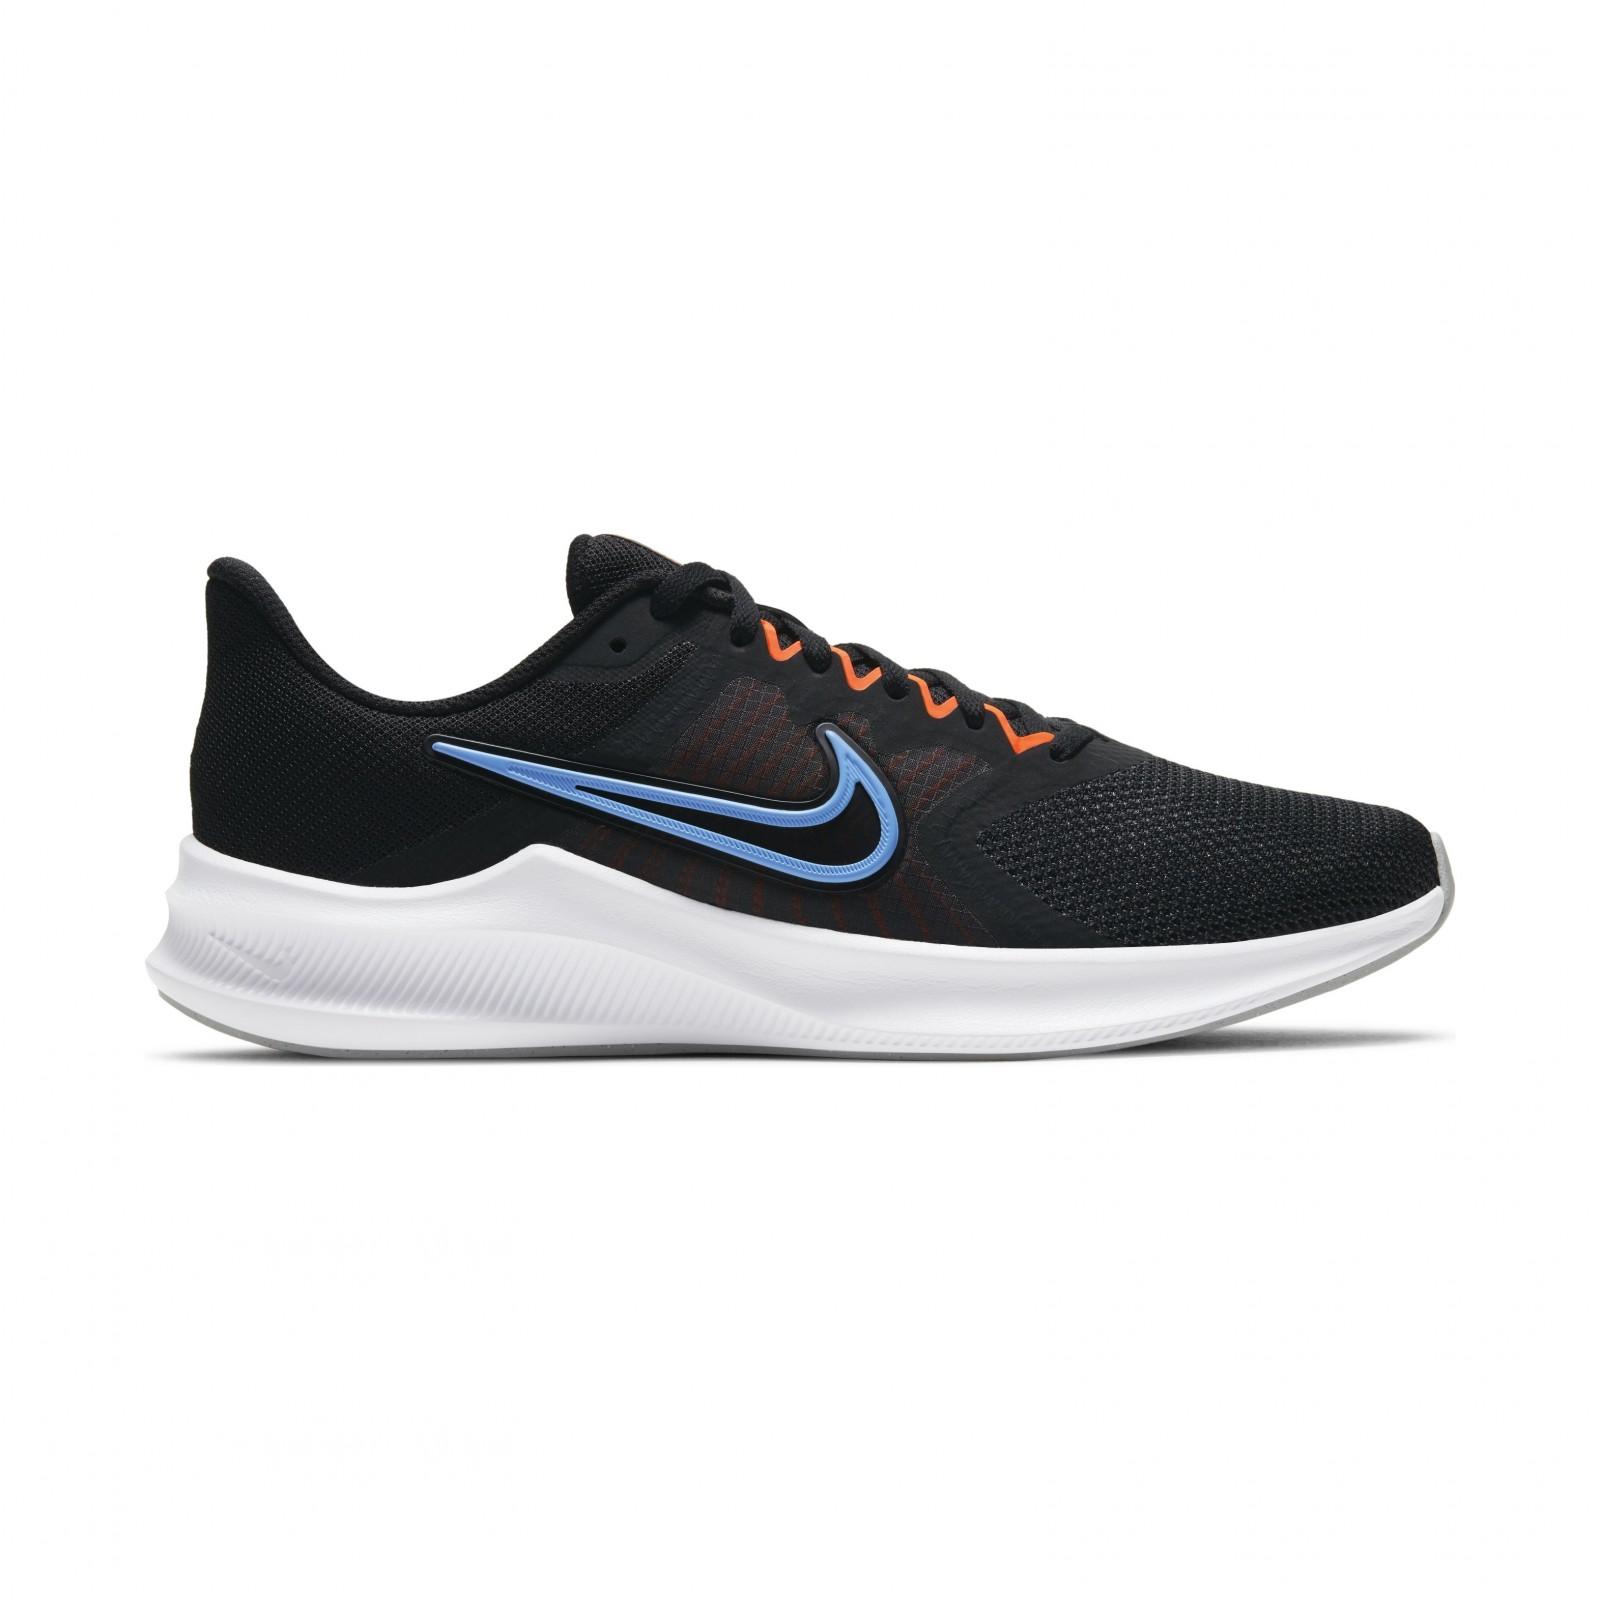 Nike Downshifter 11 BLACK/COAST-TOTAL ORANGE-DK SMOKE GREY